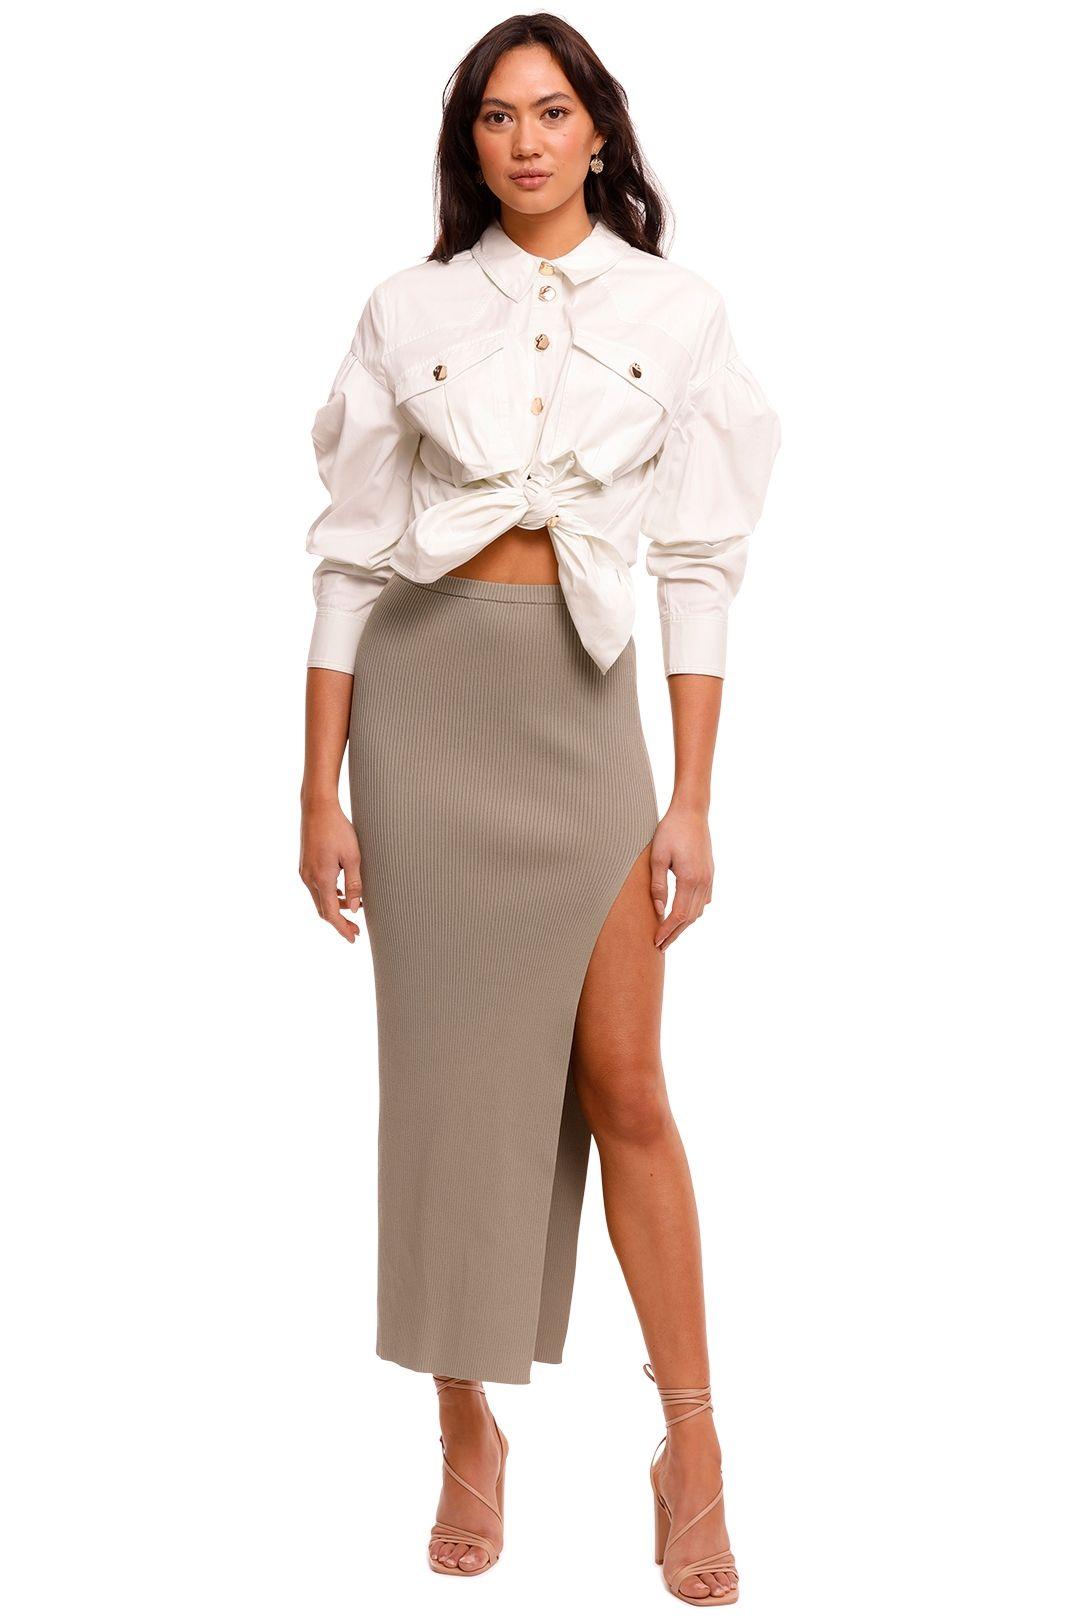 Bec and Bridge Versailles Knit Split Midi Skirt bodycon